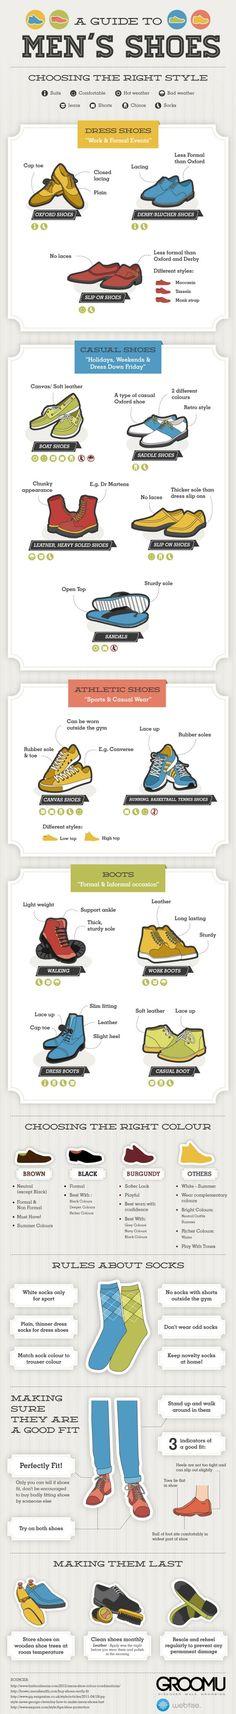 Mens shoe guide